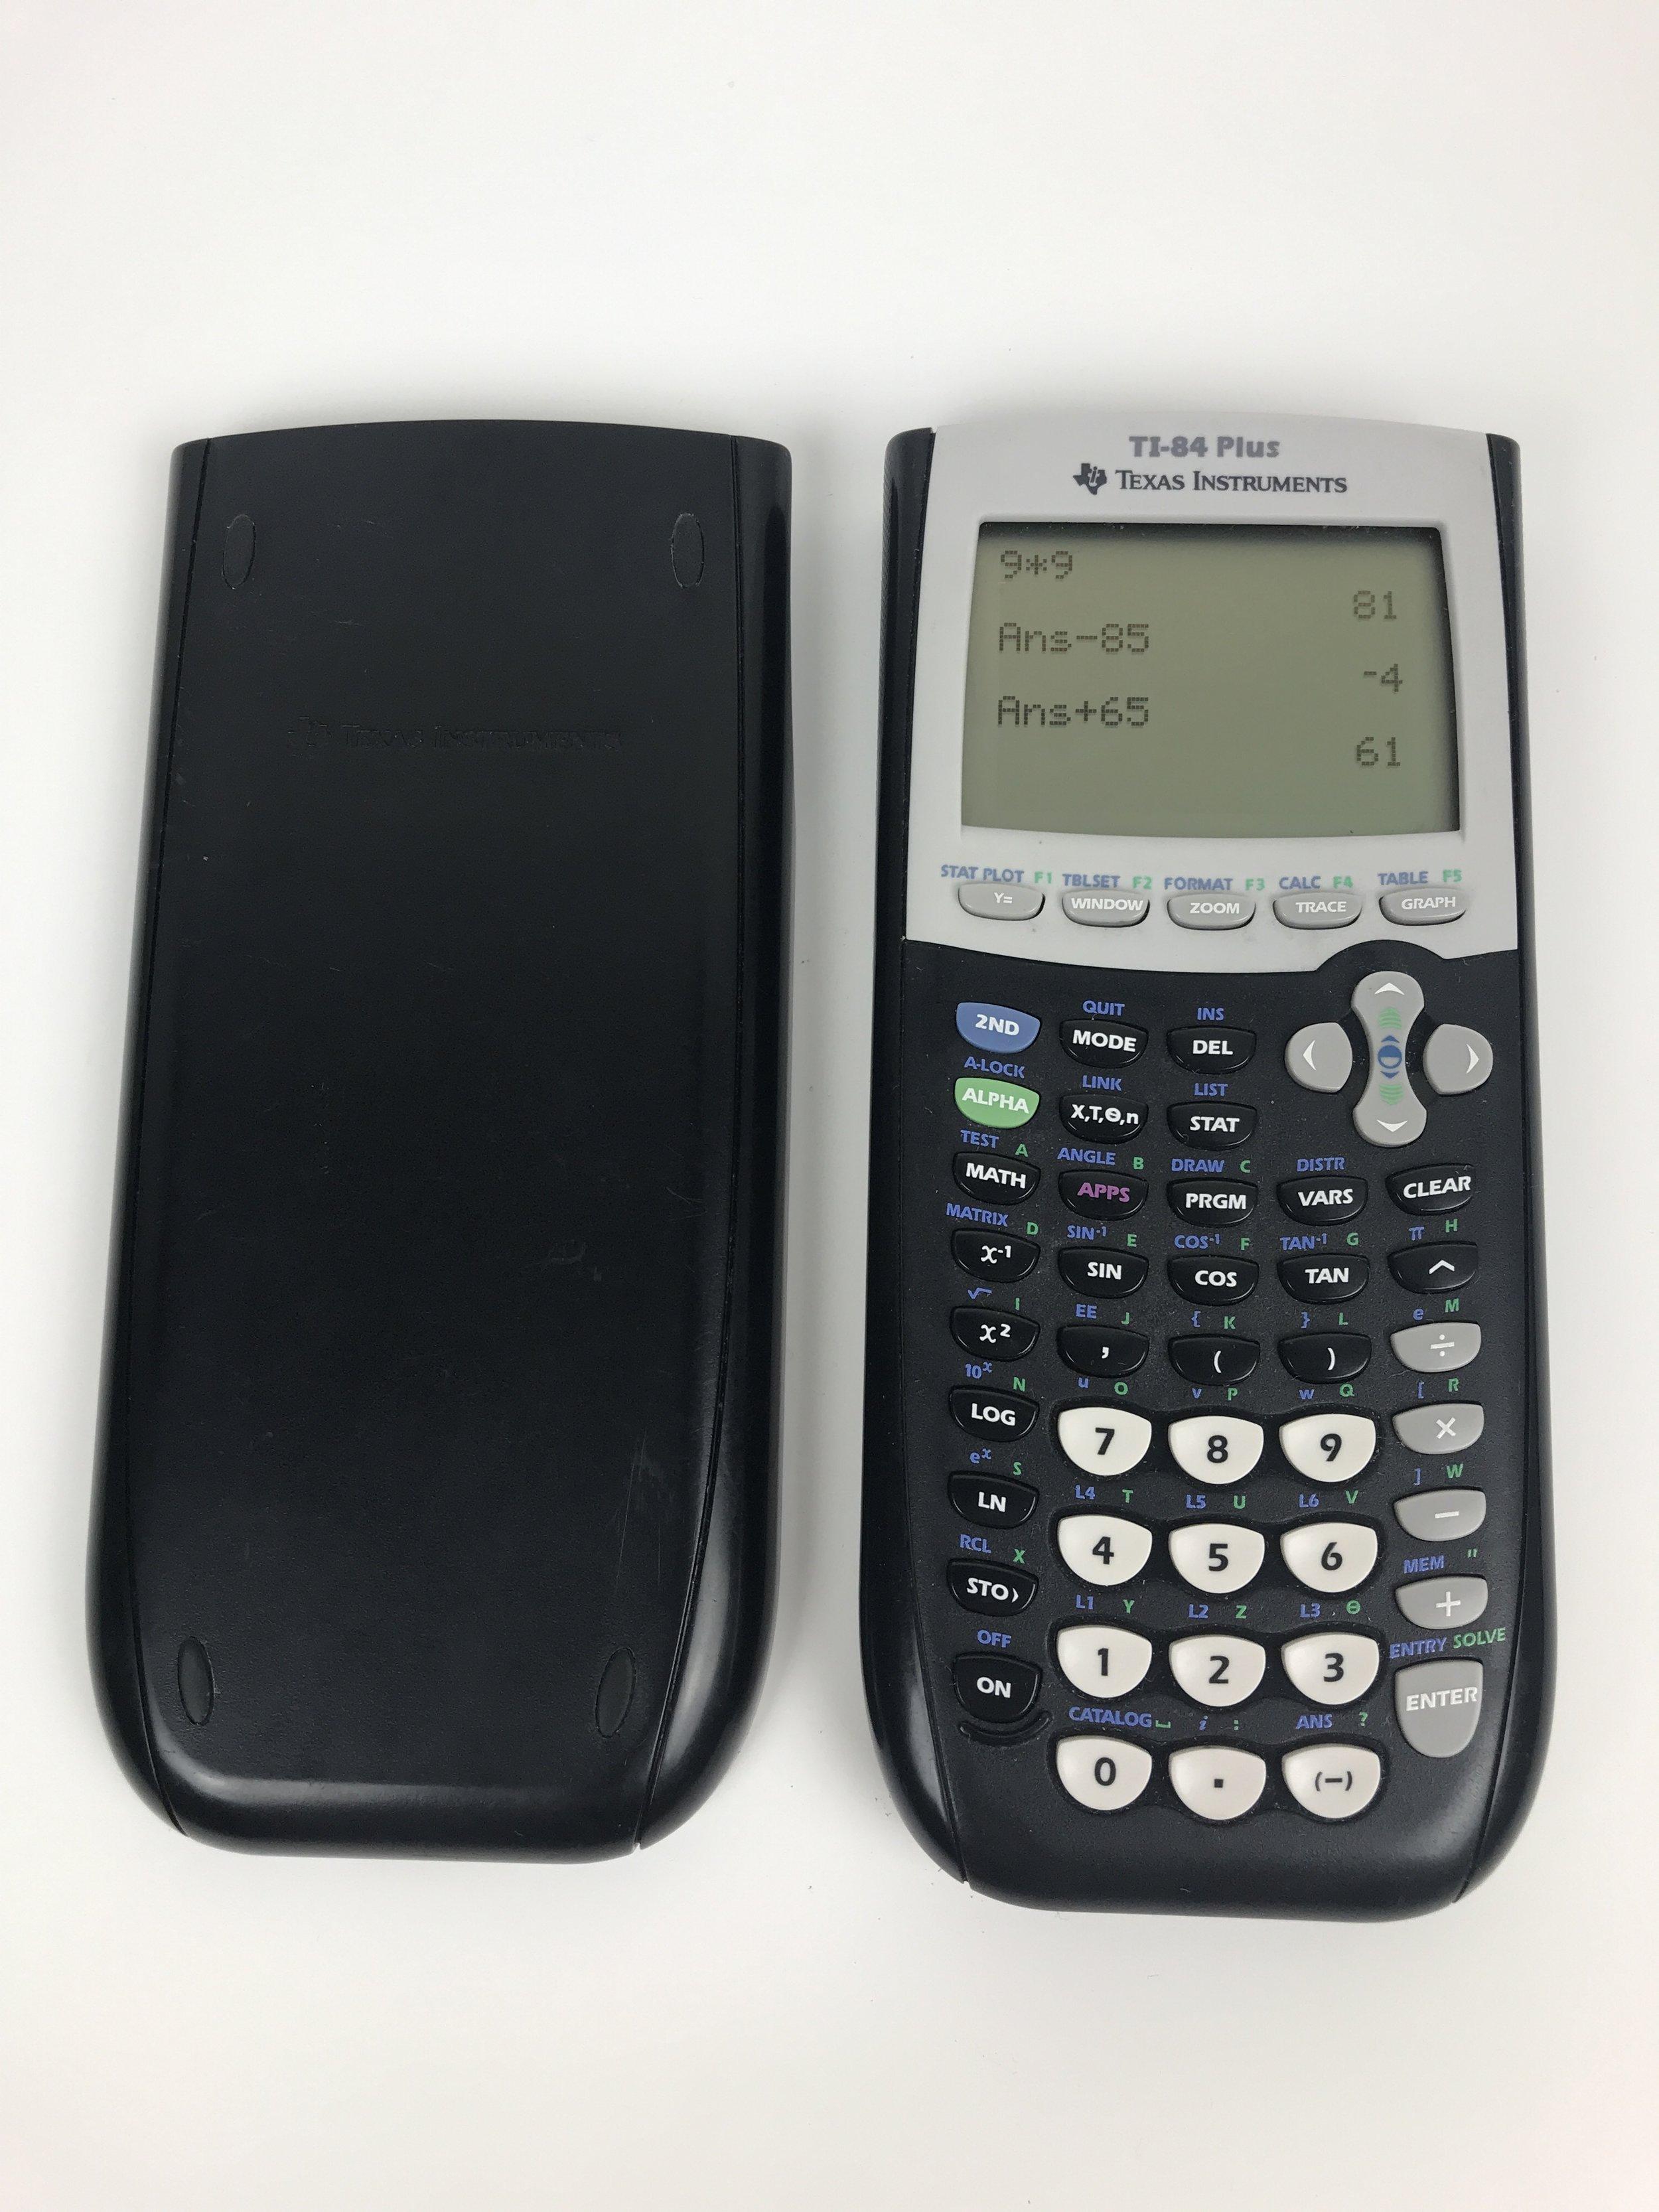 TI-84 Plus Calculator